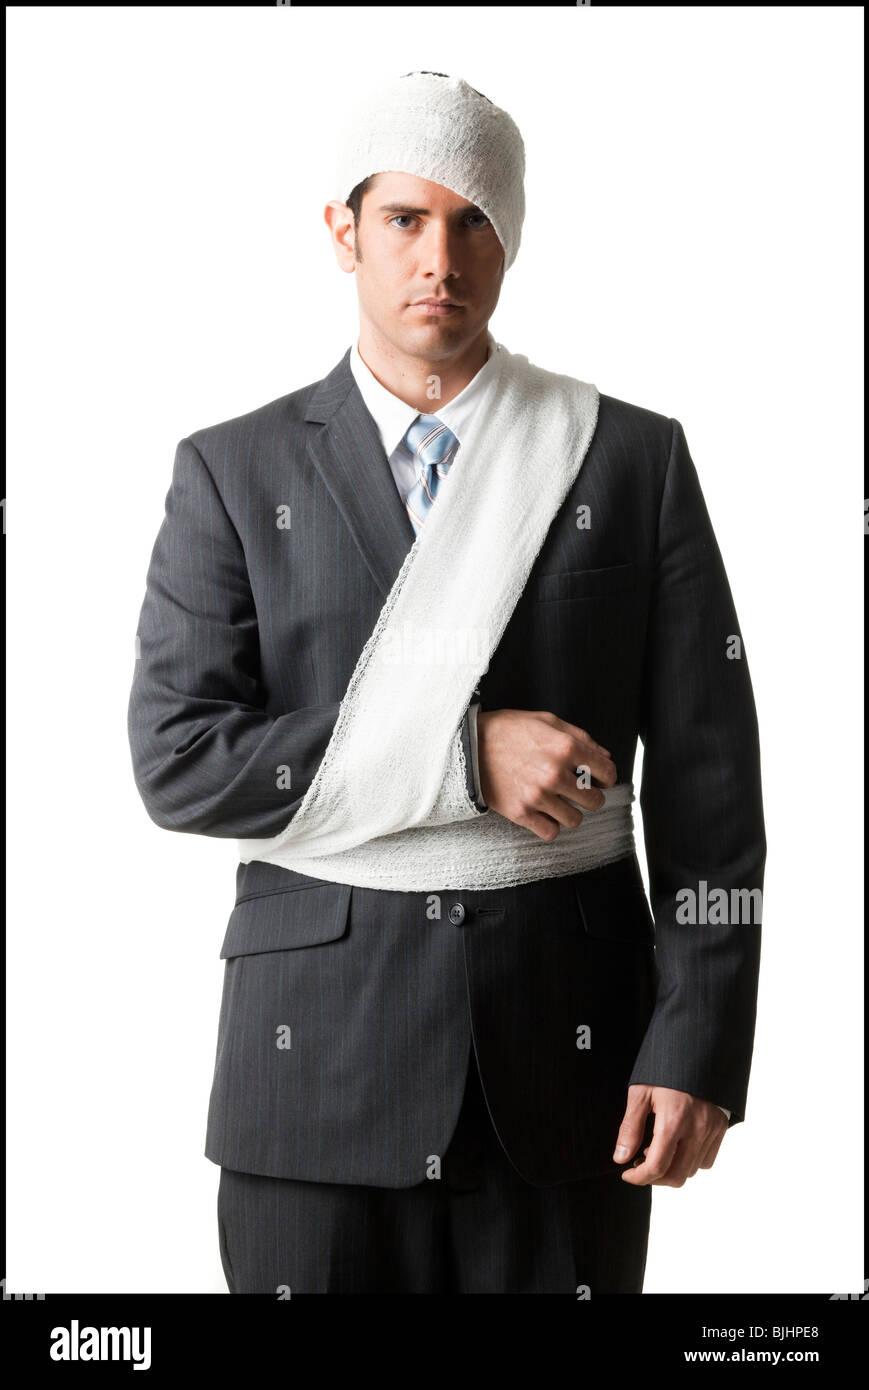 businessman with bandages on - Stock Image